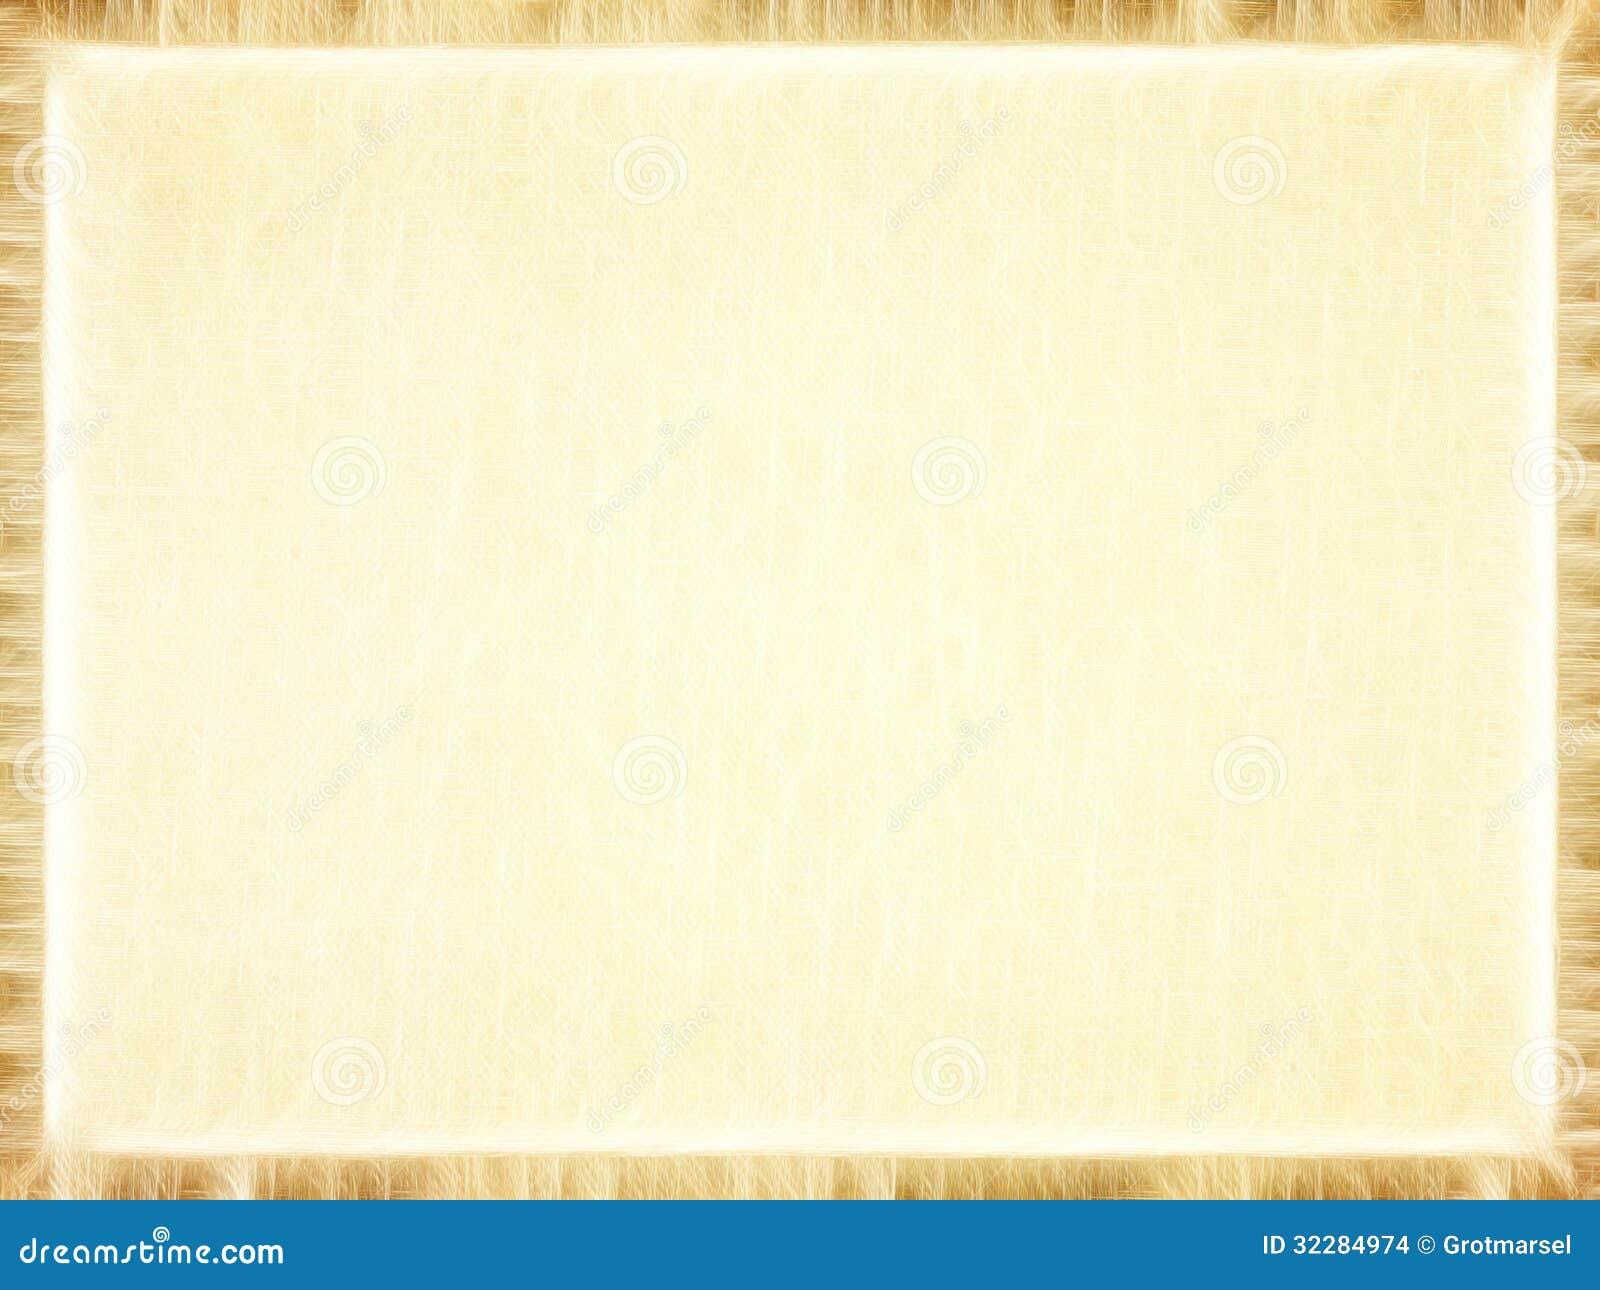 Rectangular Empty Old Paper Photo Frame.Background. Stock ...